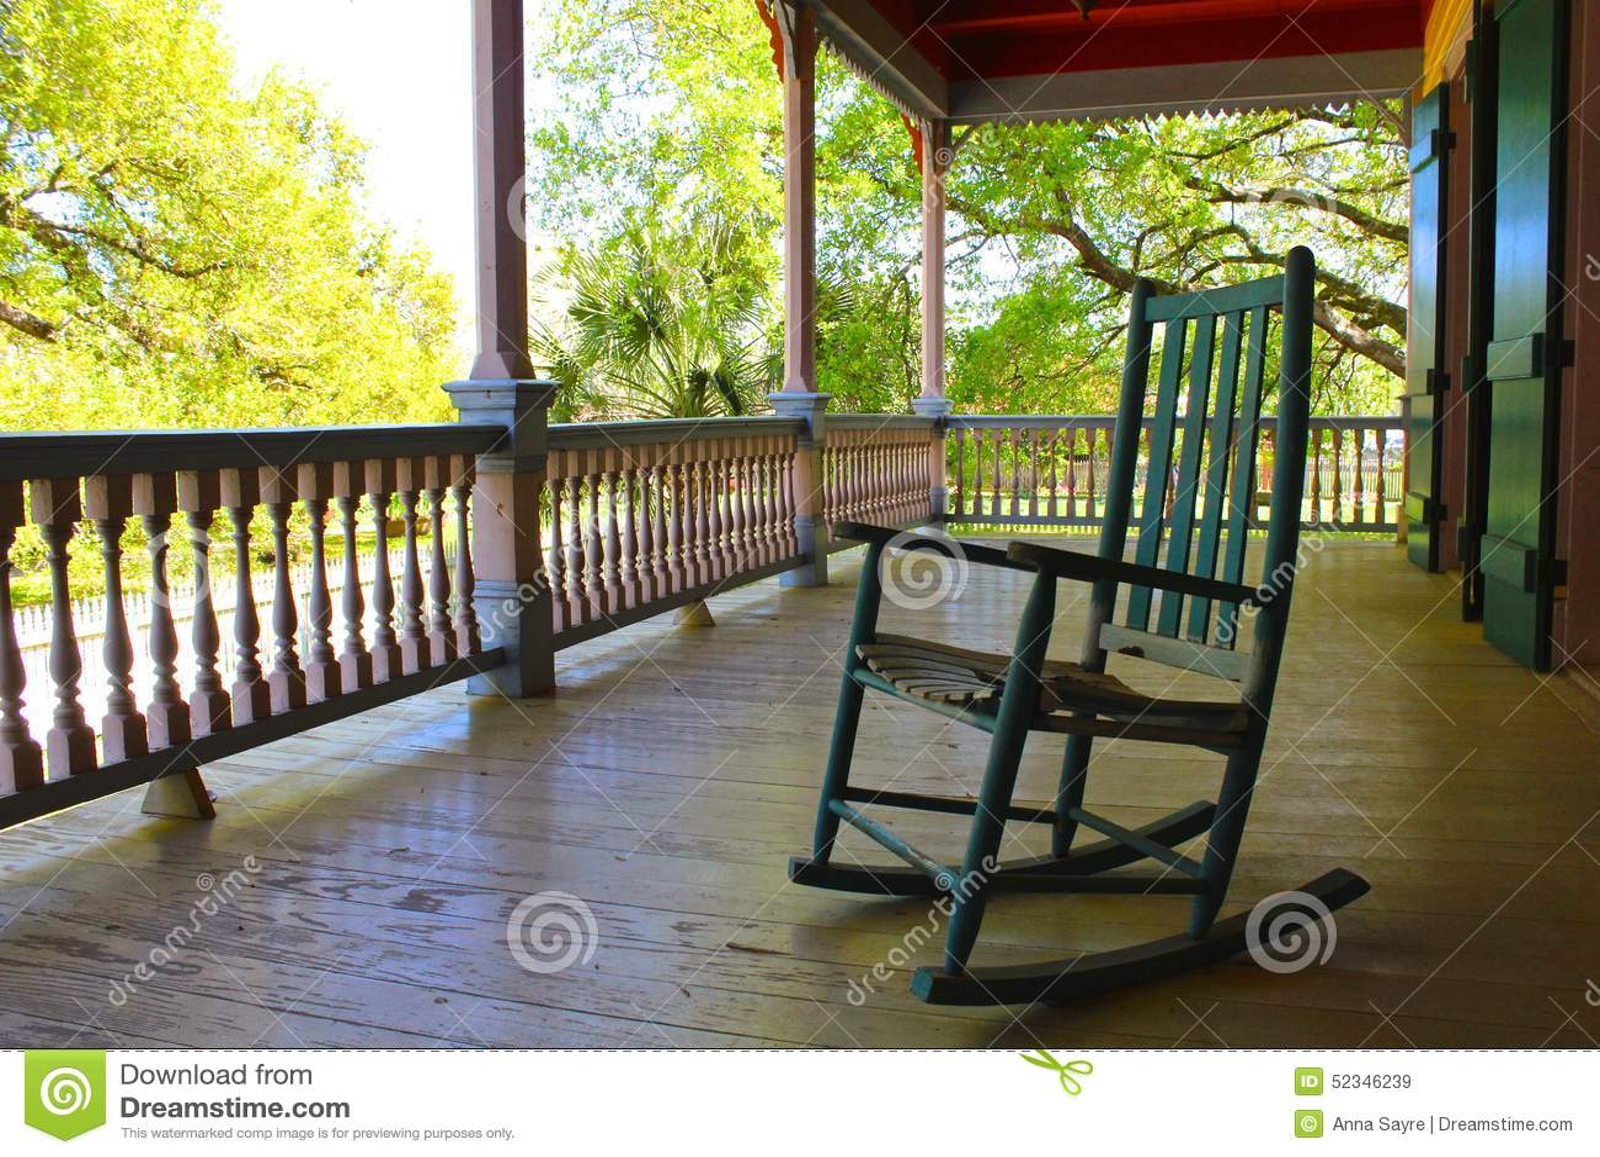 veranda chair design intex and ottoman porch stock image of southern louisiana